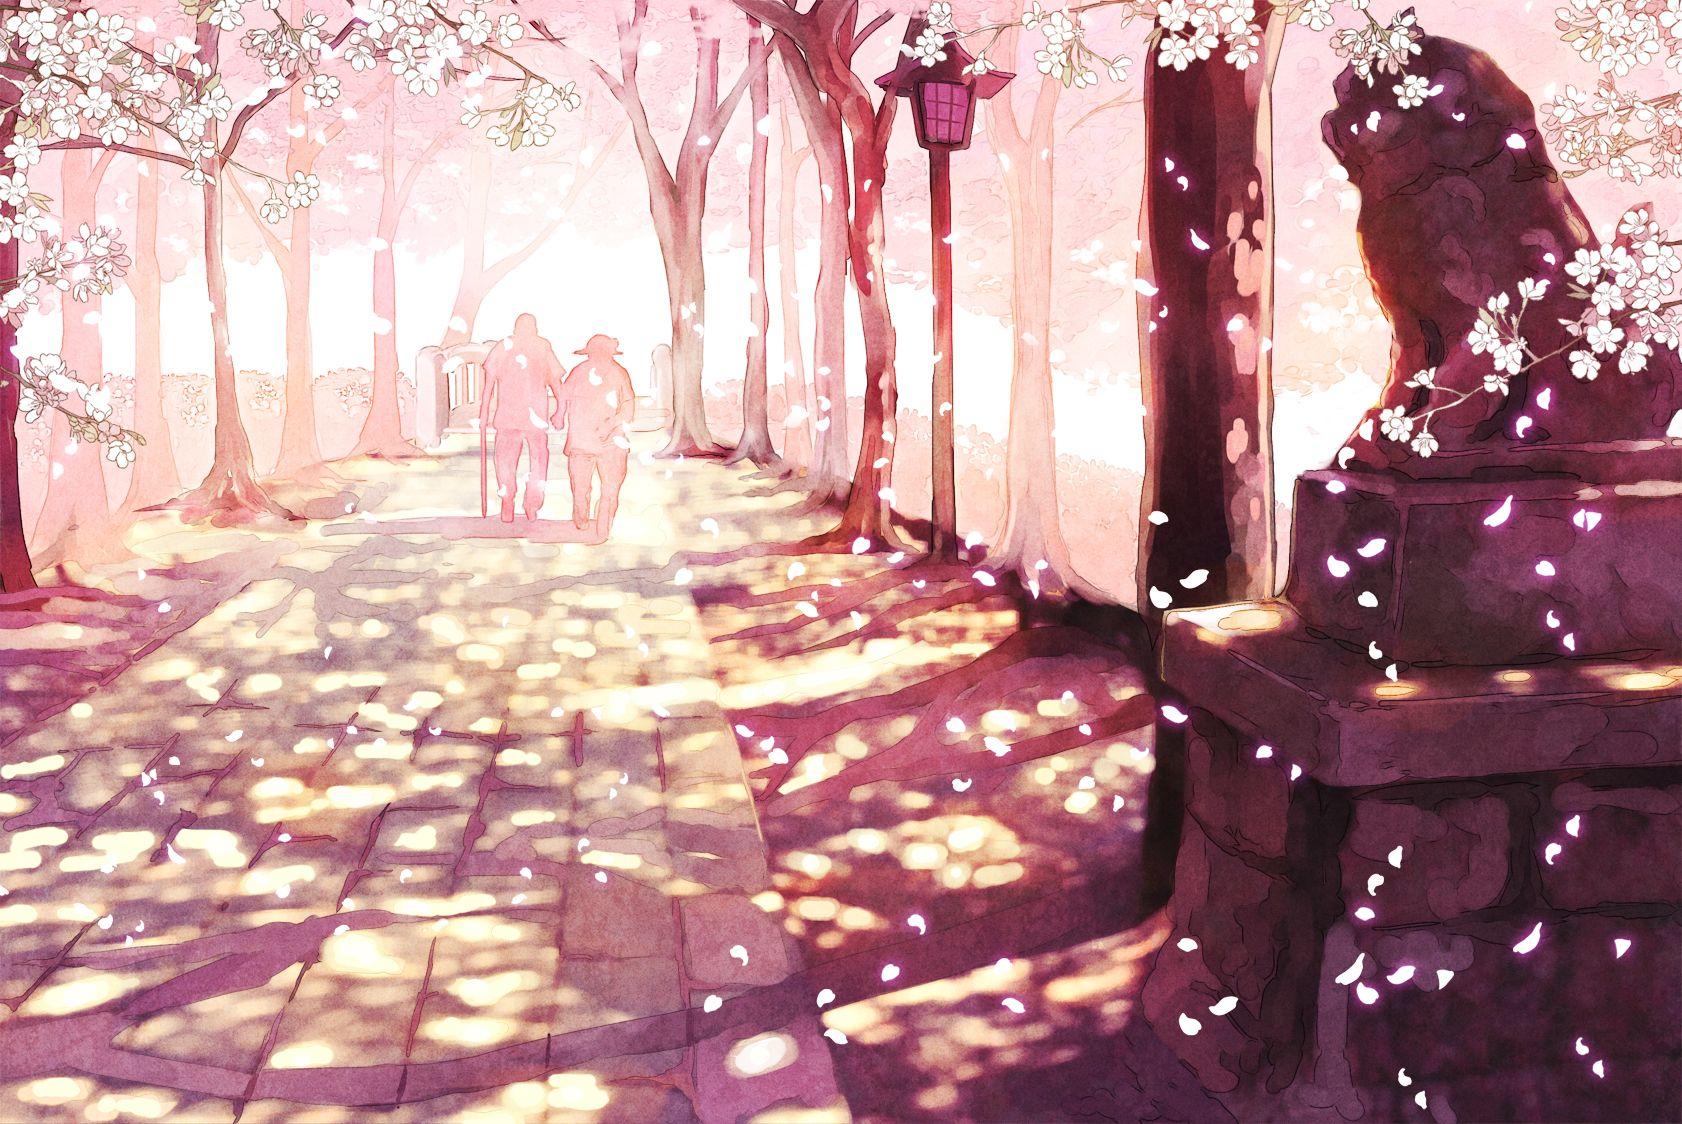 Sakura Anime Scenery 52782 1784 Japan Jpg 1682 1124 Anime Scenery Wallpaper Anime Backgrounds Wallpapers Anime Scenery